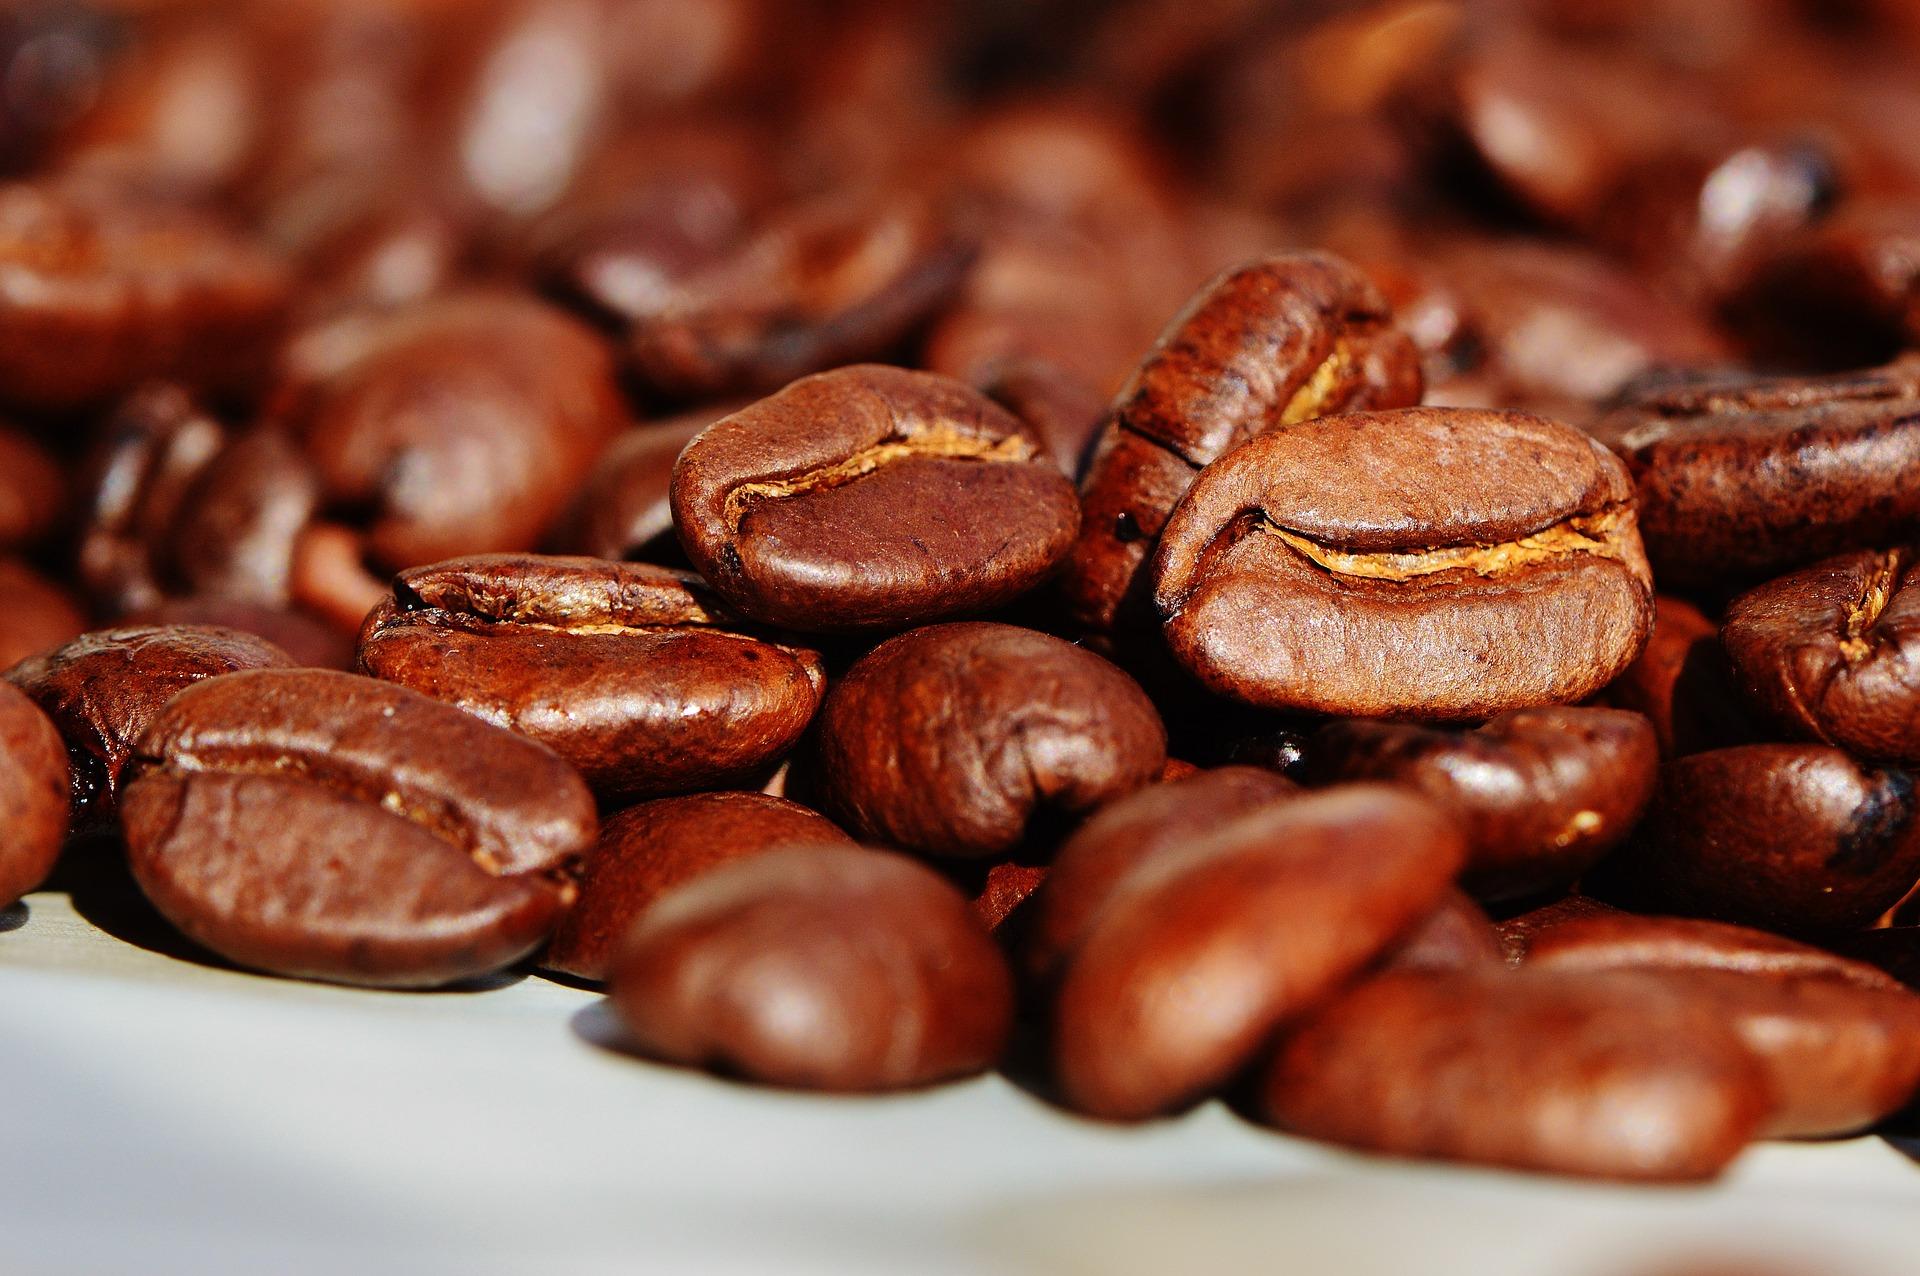 coffee-1291656_1920.jpg